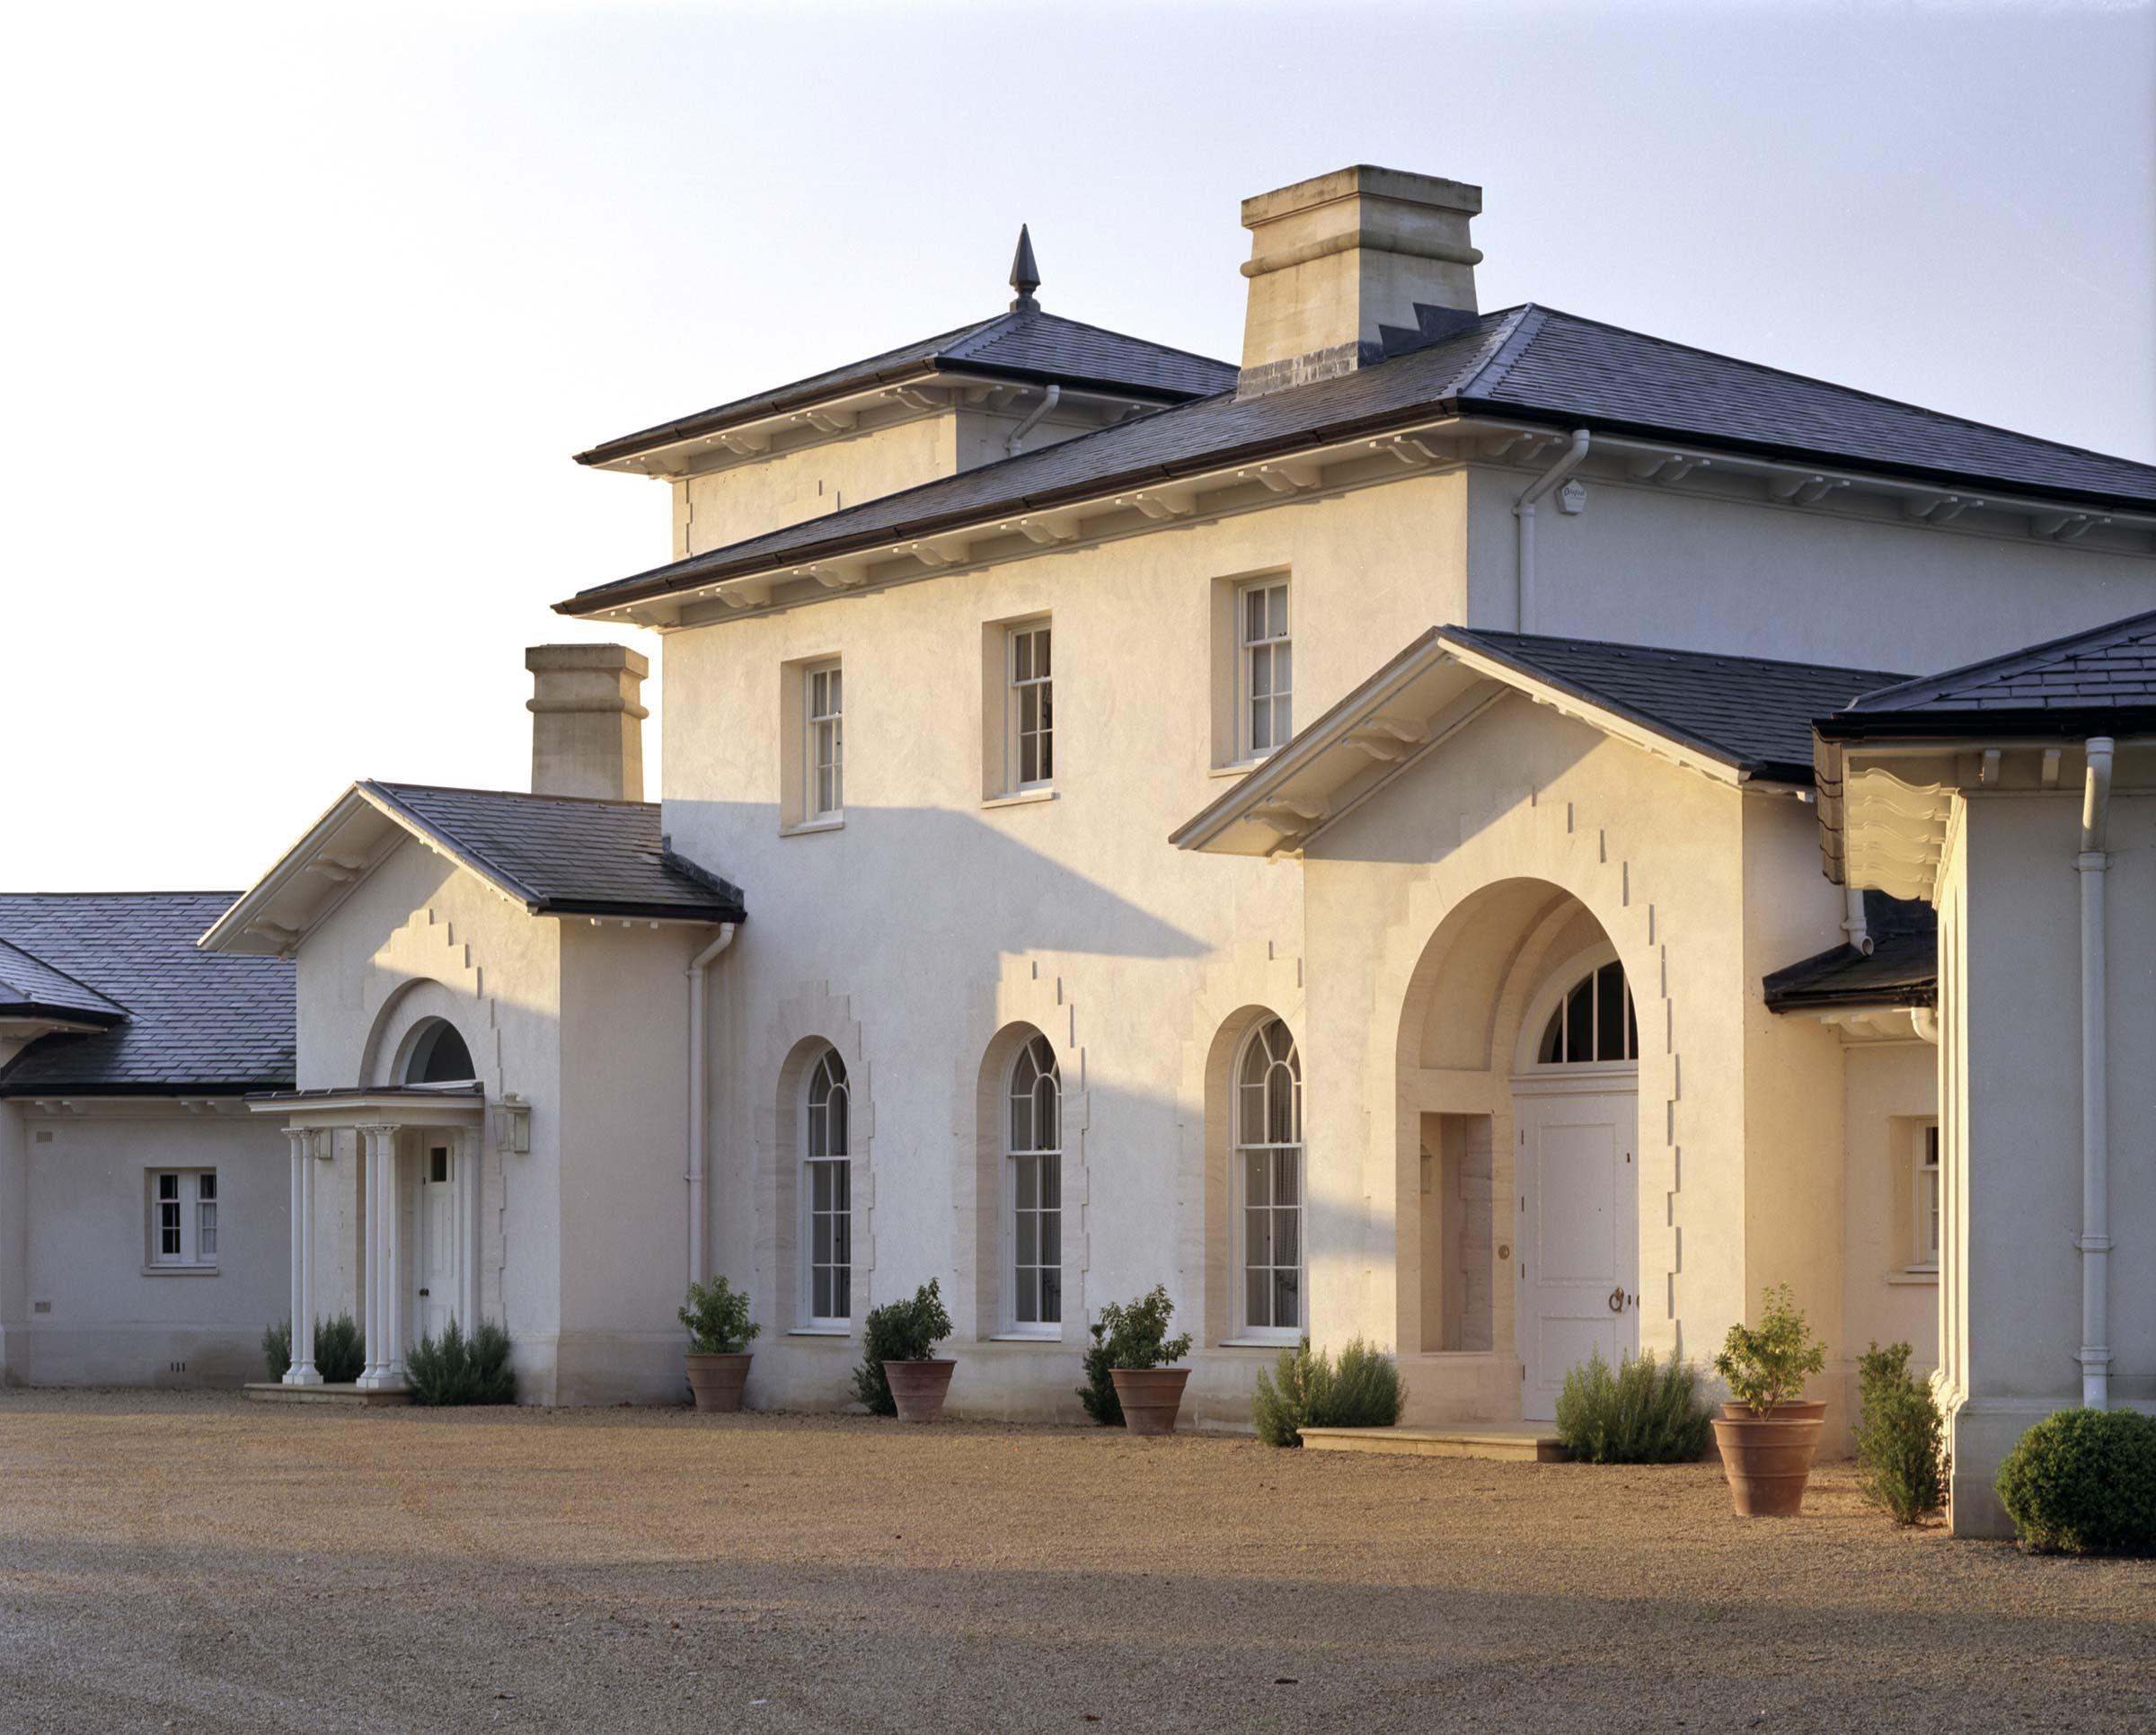 Riverside country house, Dorset